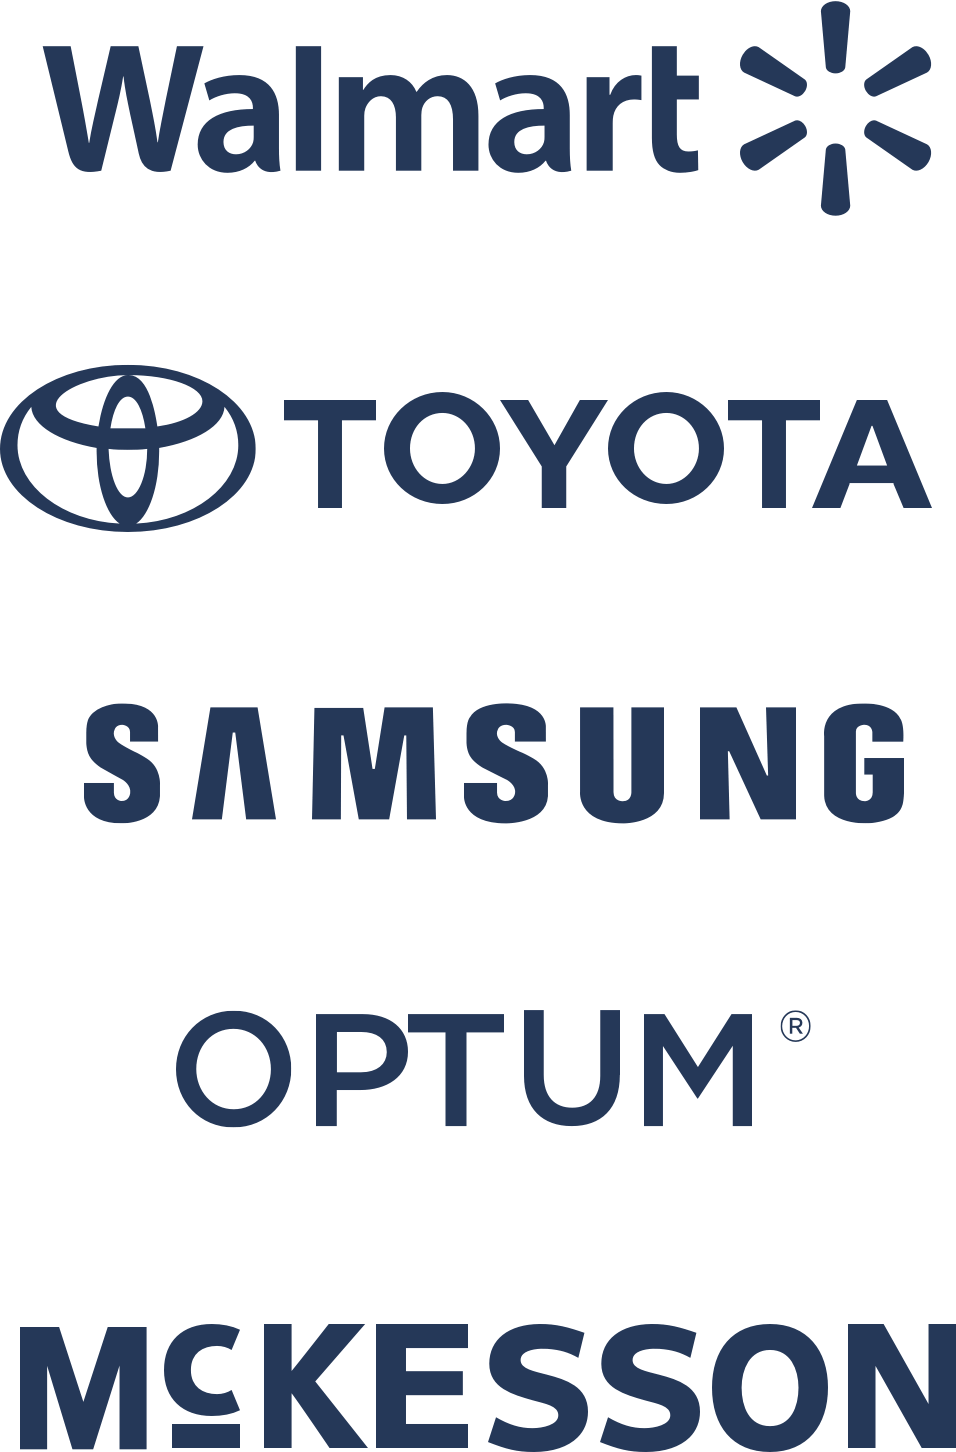 Logos: Walmart, Toyota, Samsung, Optum, McKesson